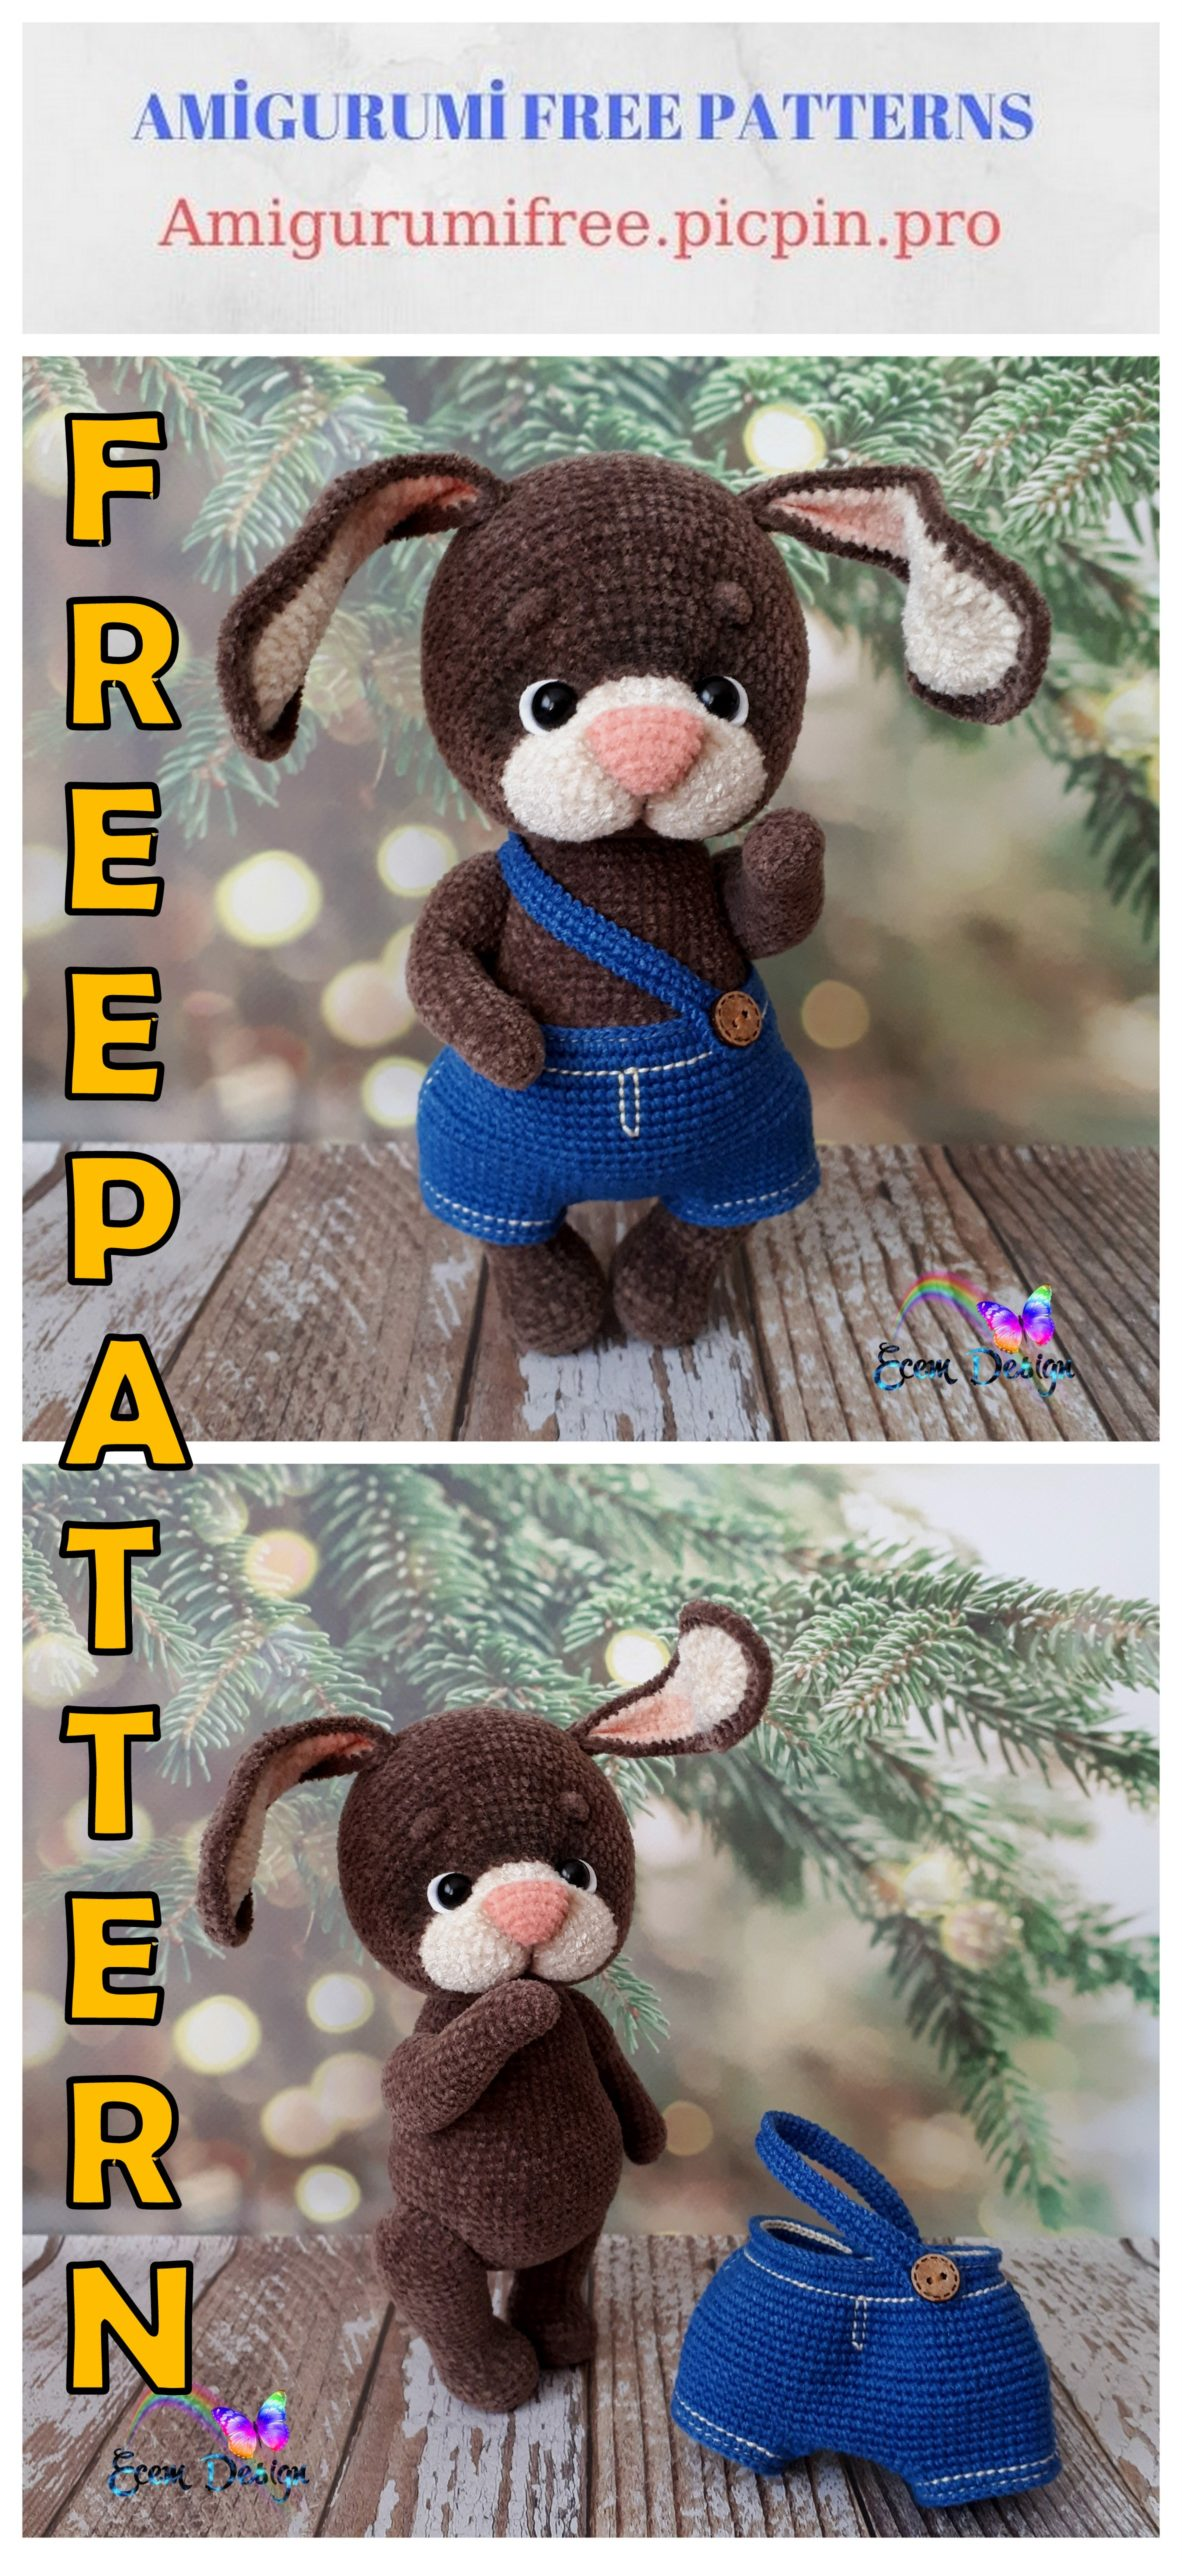 Velvet Bunny Amigurumi Free Crochet Pattern | Crochet patterns ... | 2560x1182